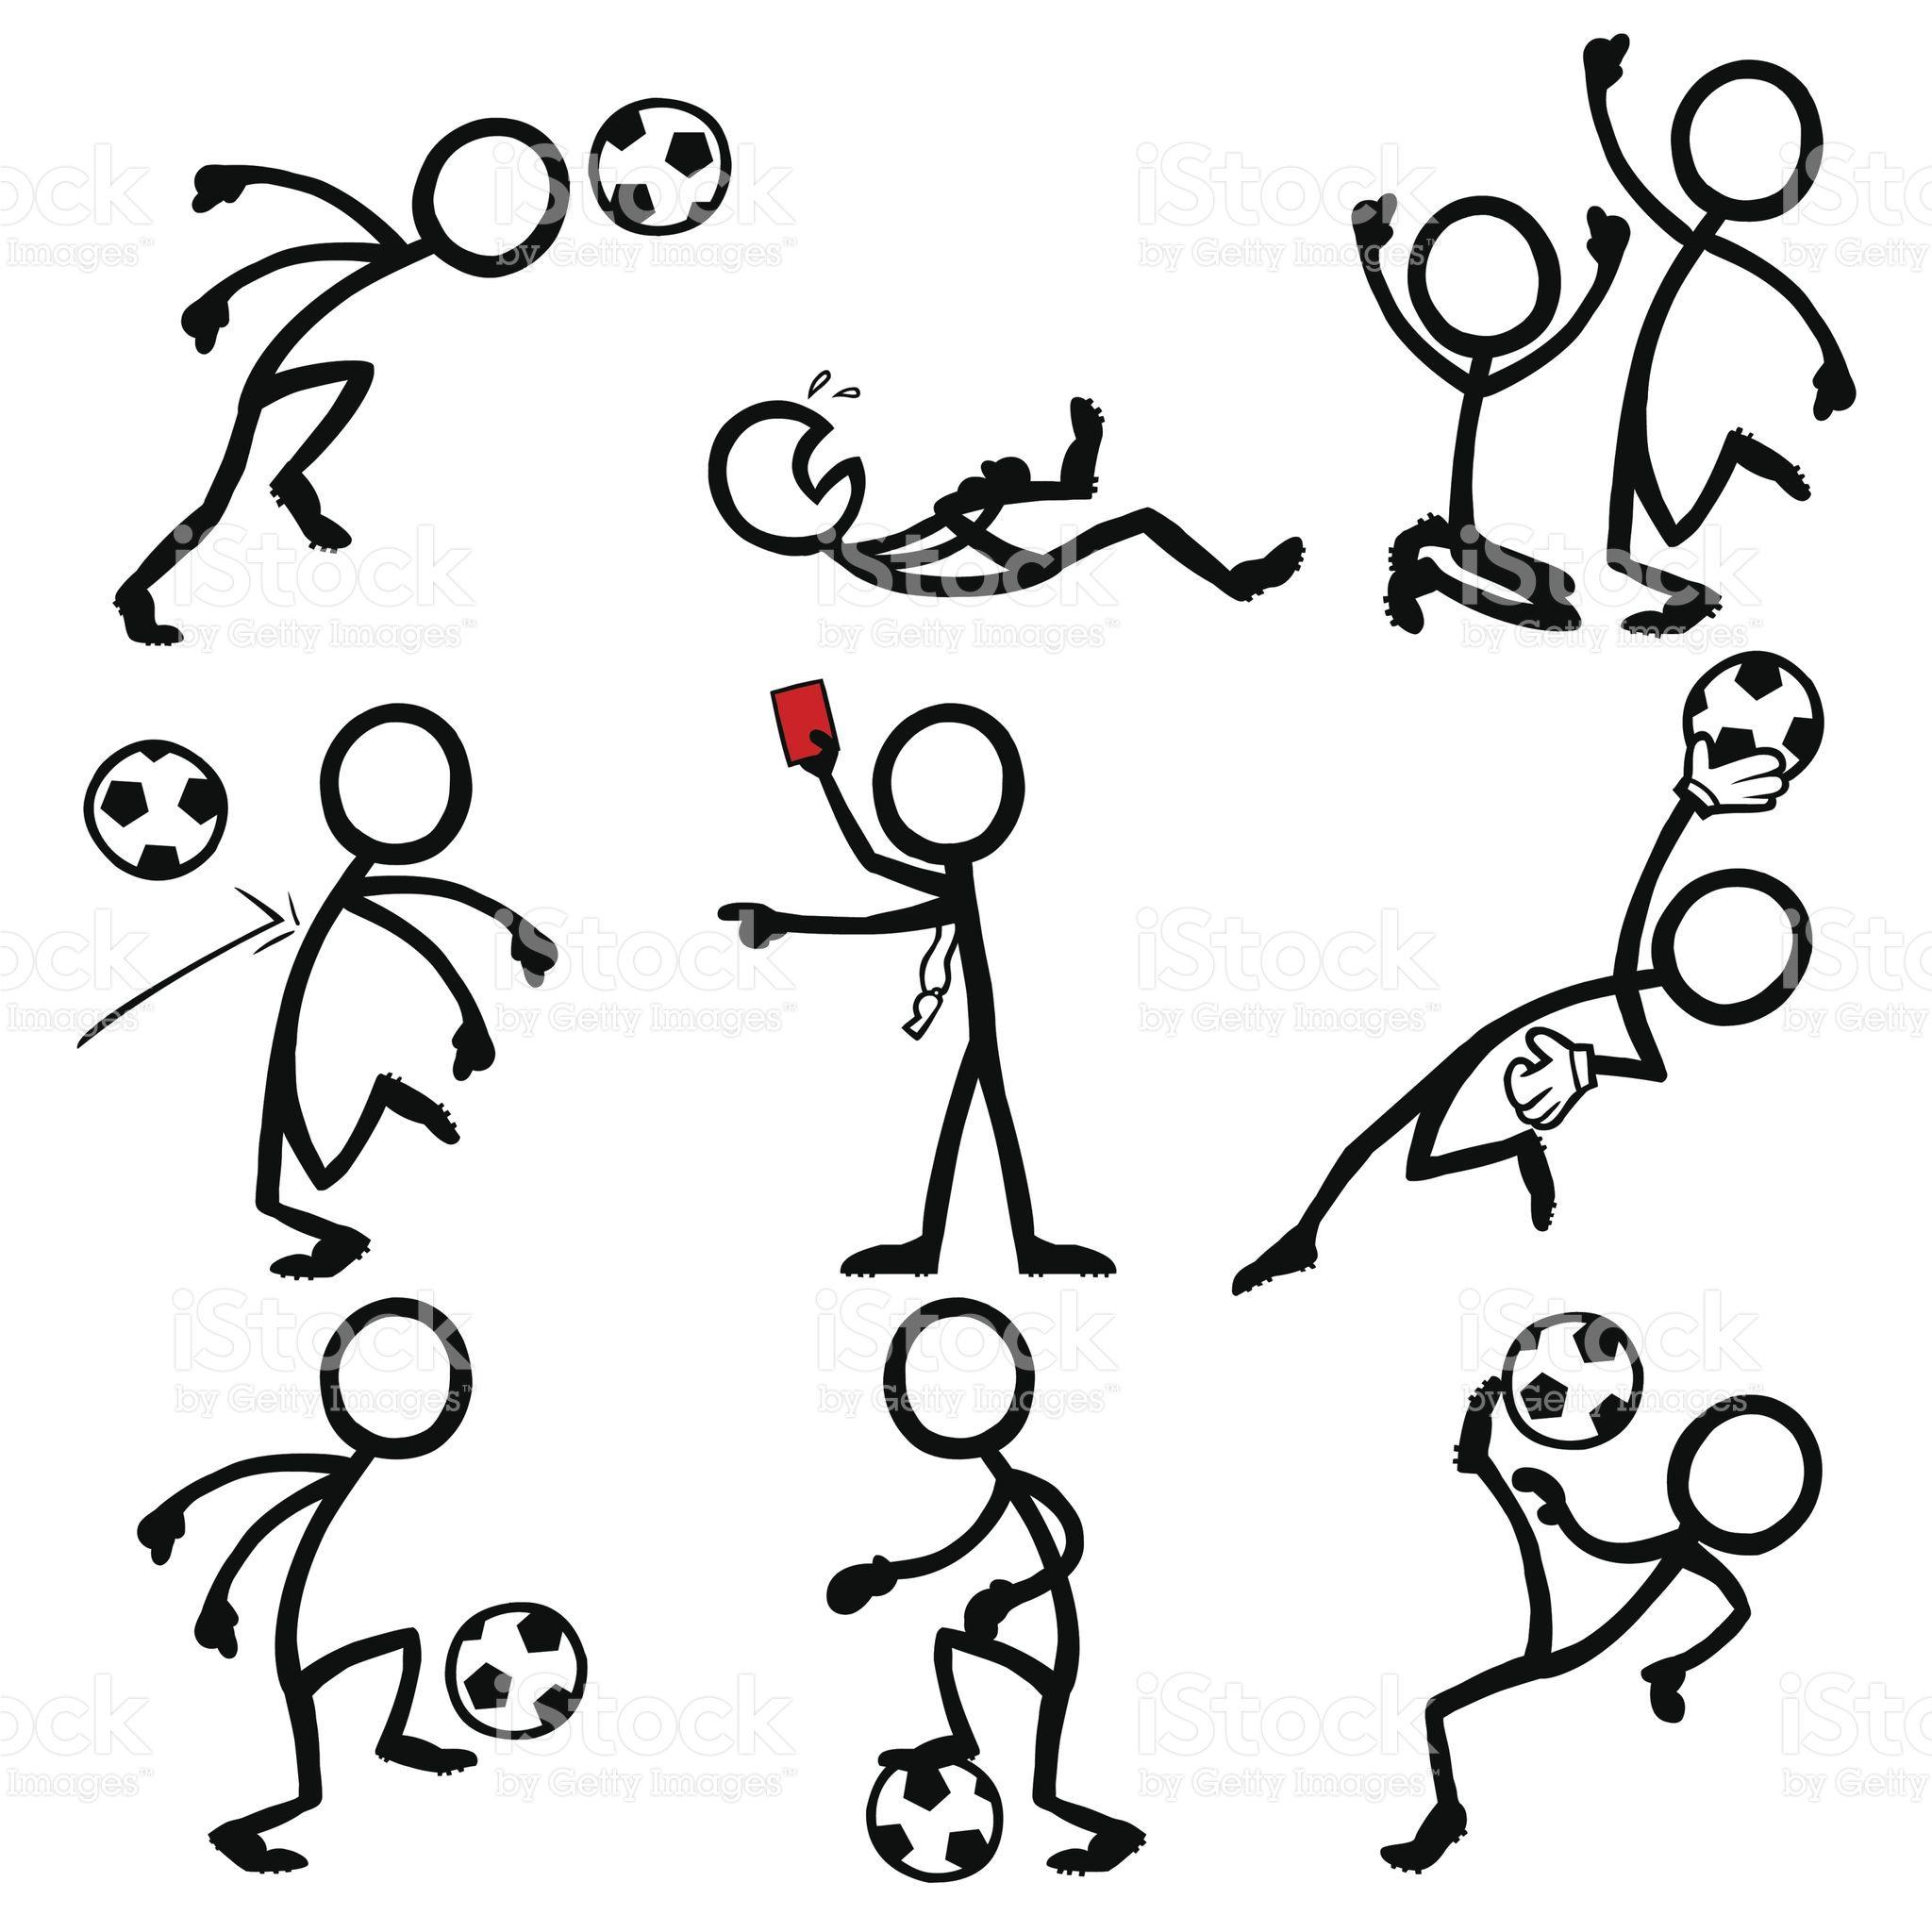 Stick Figure Peoples Playing Soccer Dibujos Garabateados Dibujos De Futbol Notas De Dibujo